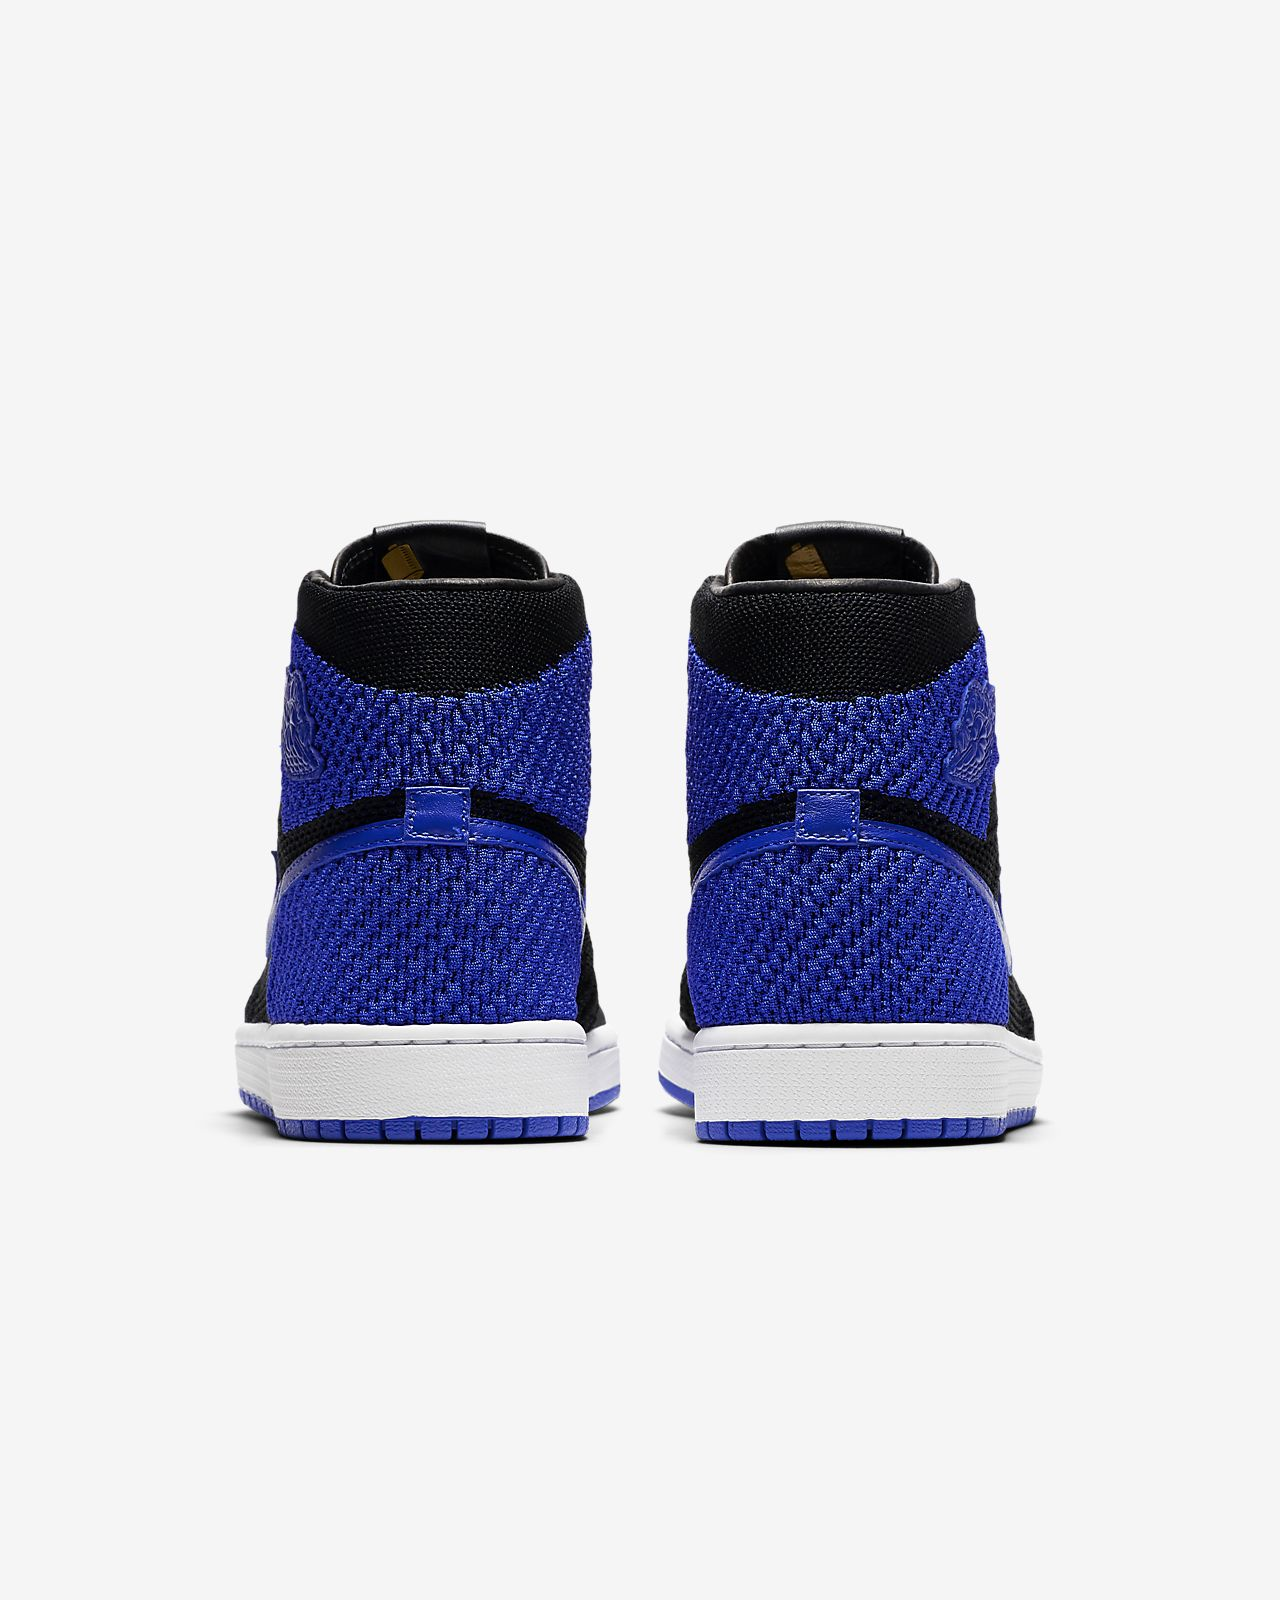 82816a8ca972 Air Jordan 1 Retro High Flyknit Men s Shoe. Nike.com ZA